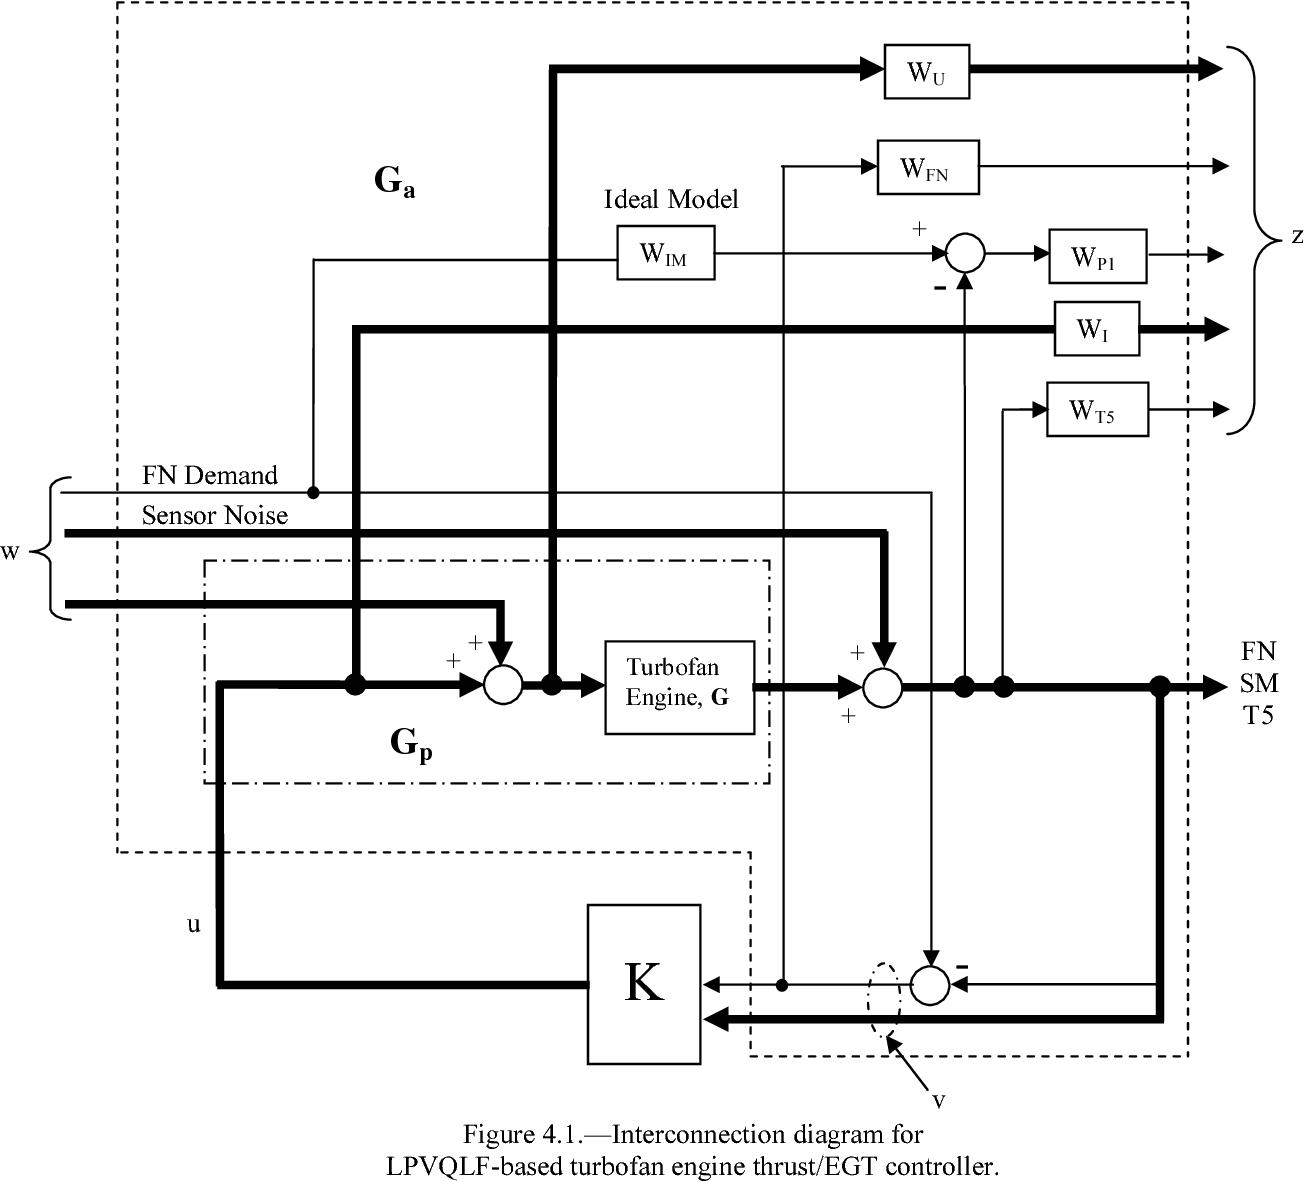 Intelligent Robust Control Of Deteriorated Turbofan Engines Via T5 Engine Diagram Linear Parameter Varying Quadratic Lyapunov Function Design Semantic Scholar